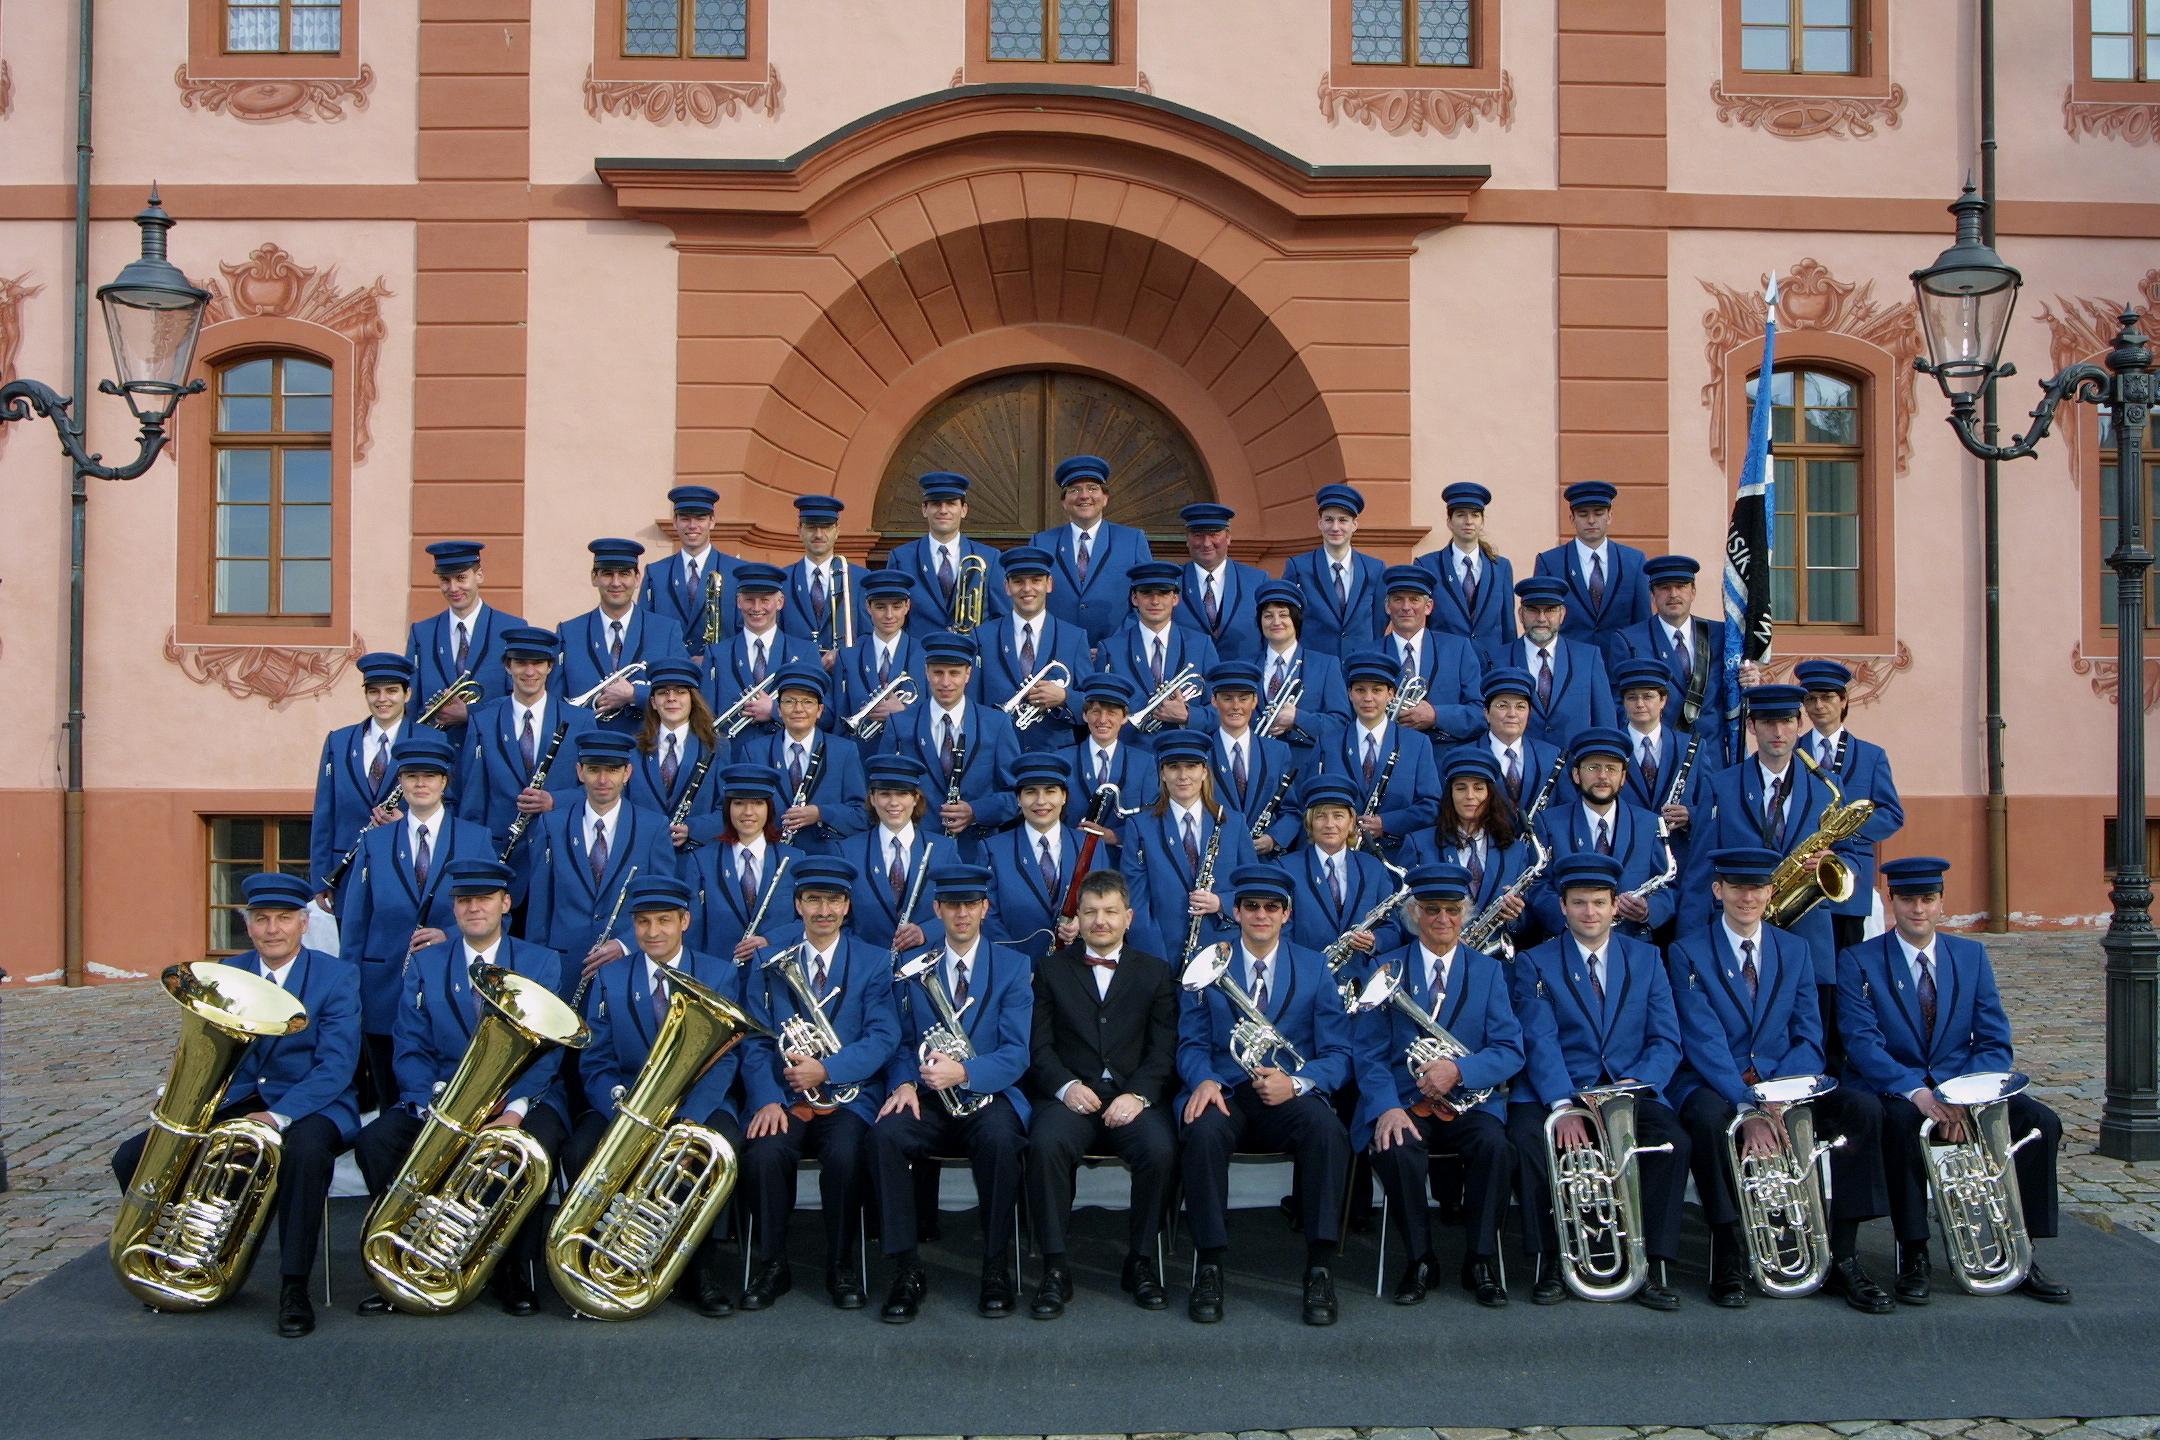 Musikverein Hitzkirch